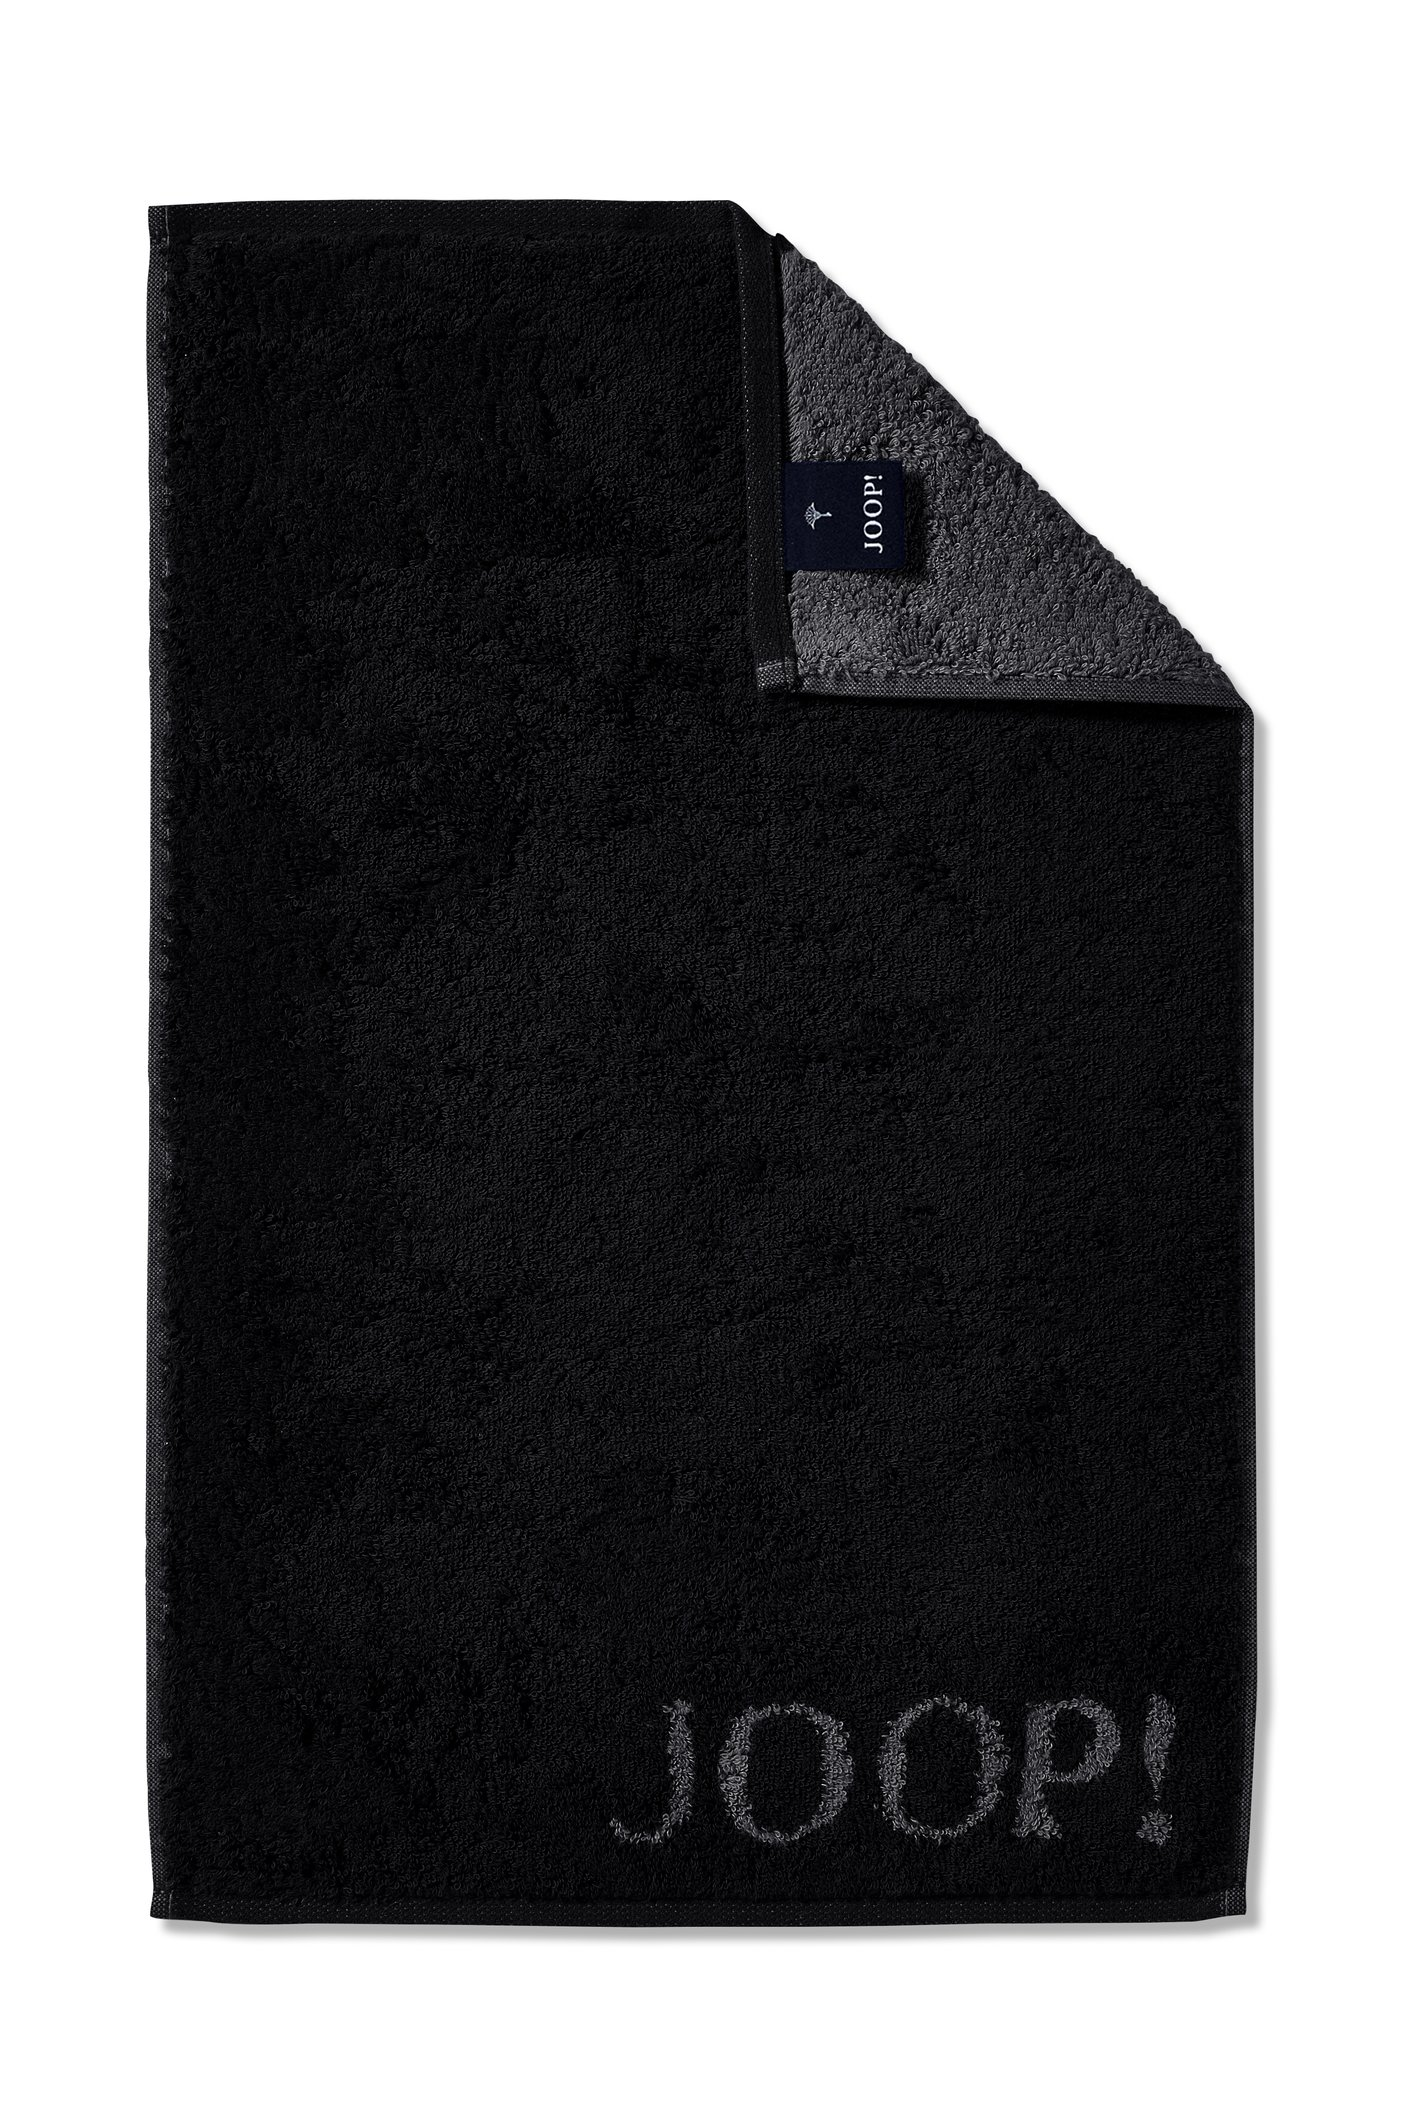 JOOP! Classic Doubleface Gästetuch 30x50 cm 1600-90 Schwarz Kollektion 2020